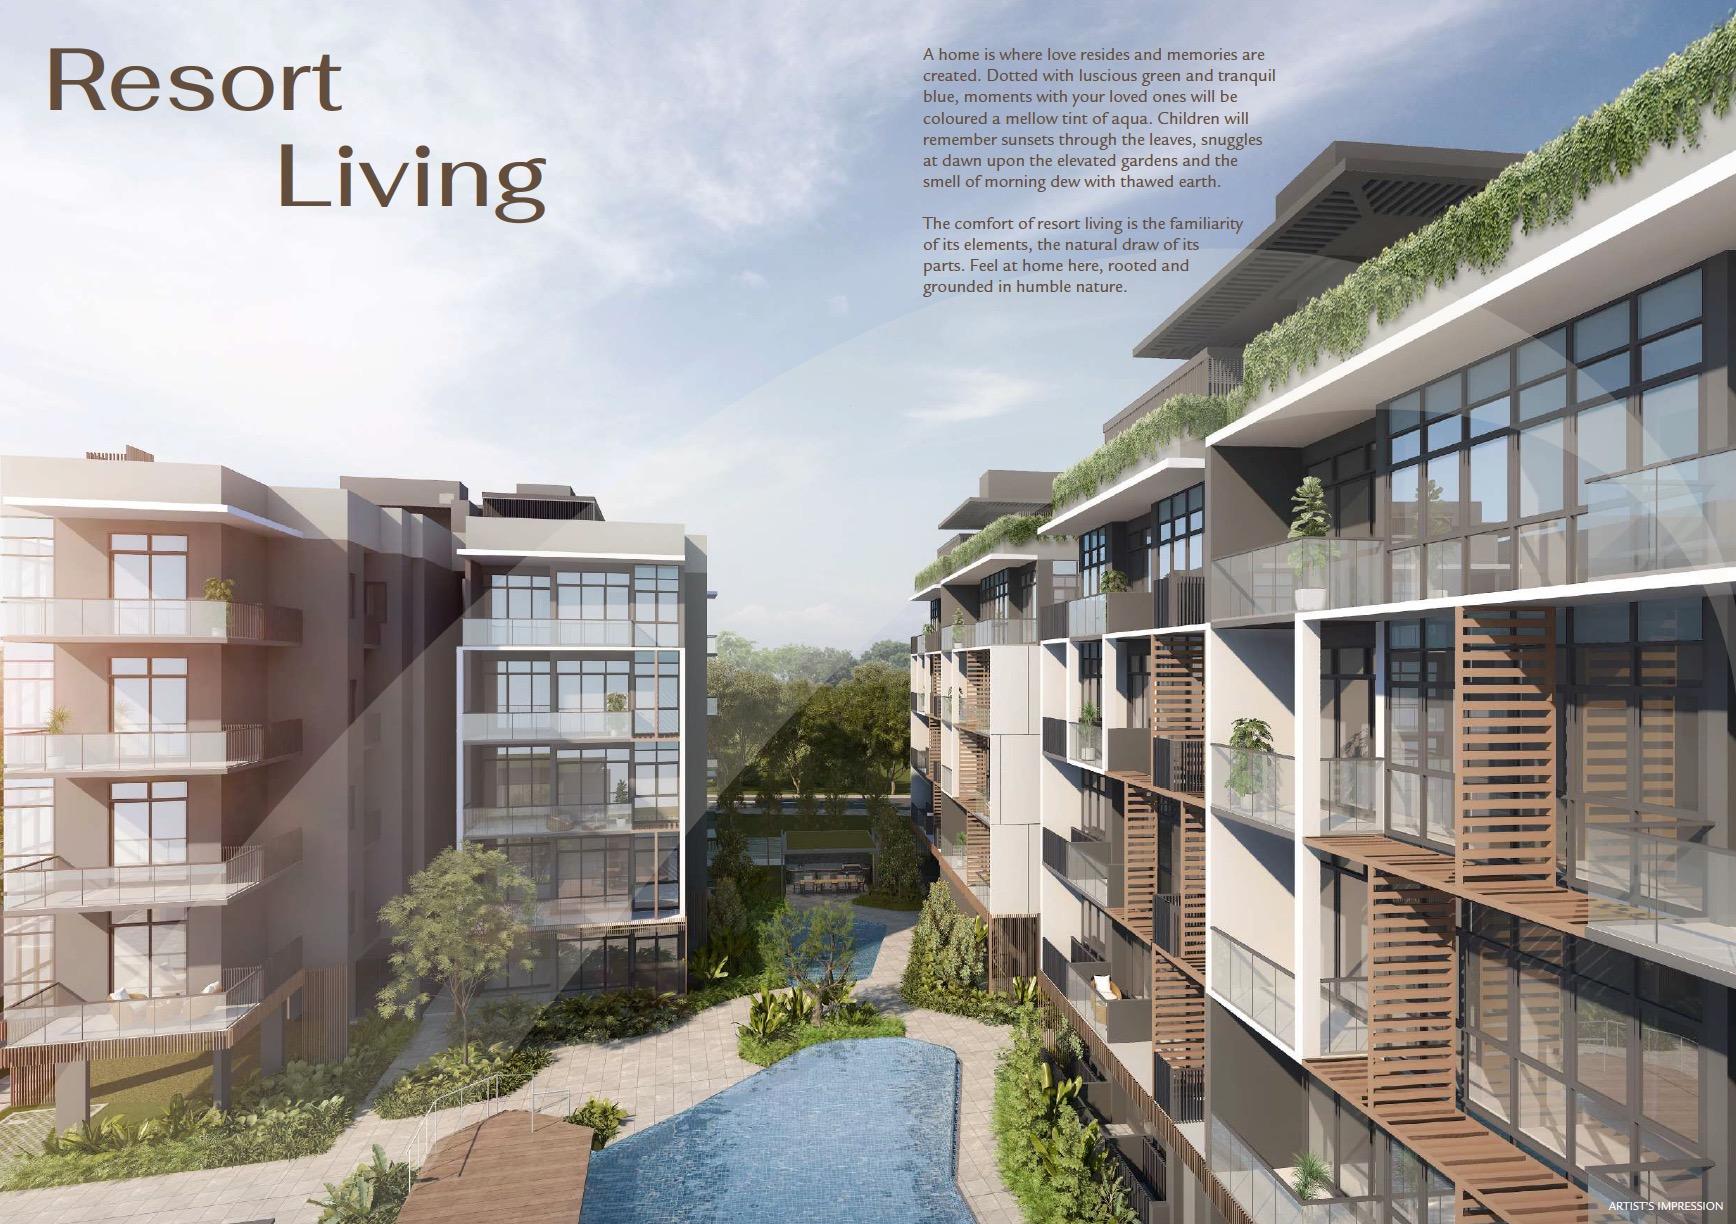 Phoenix Residences resort living